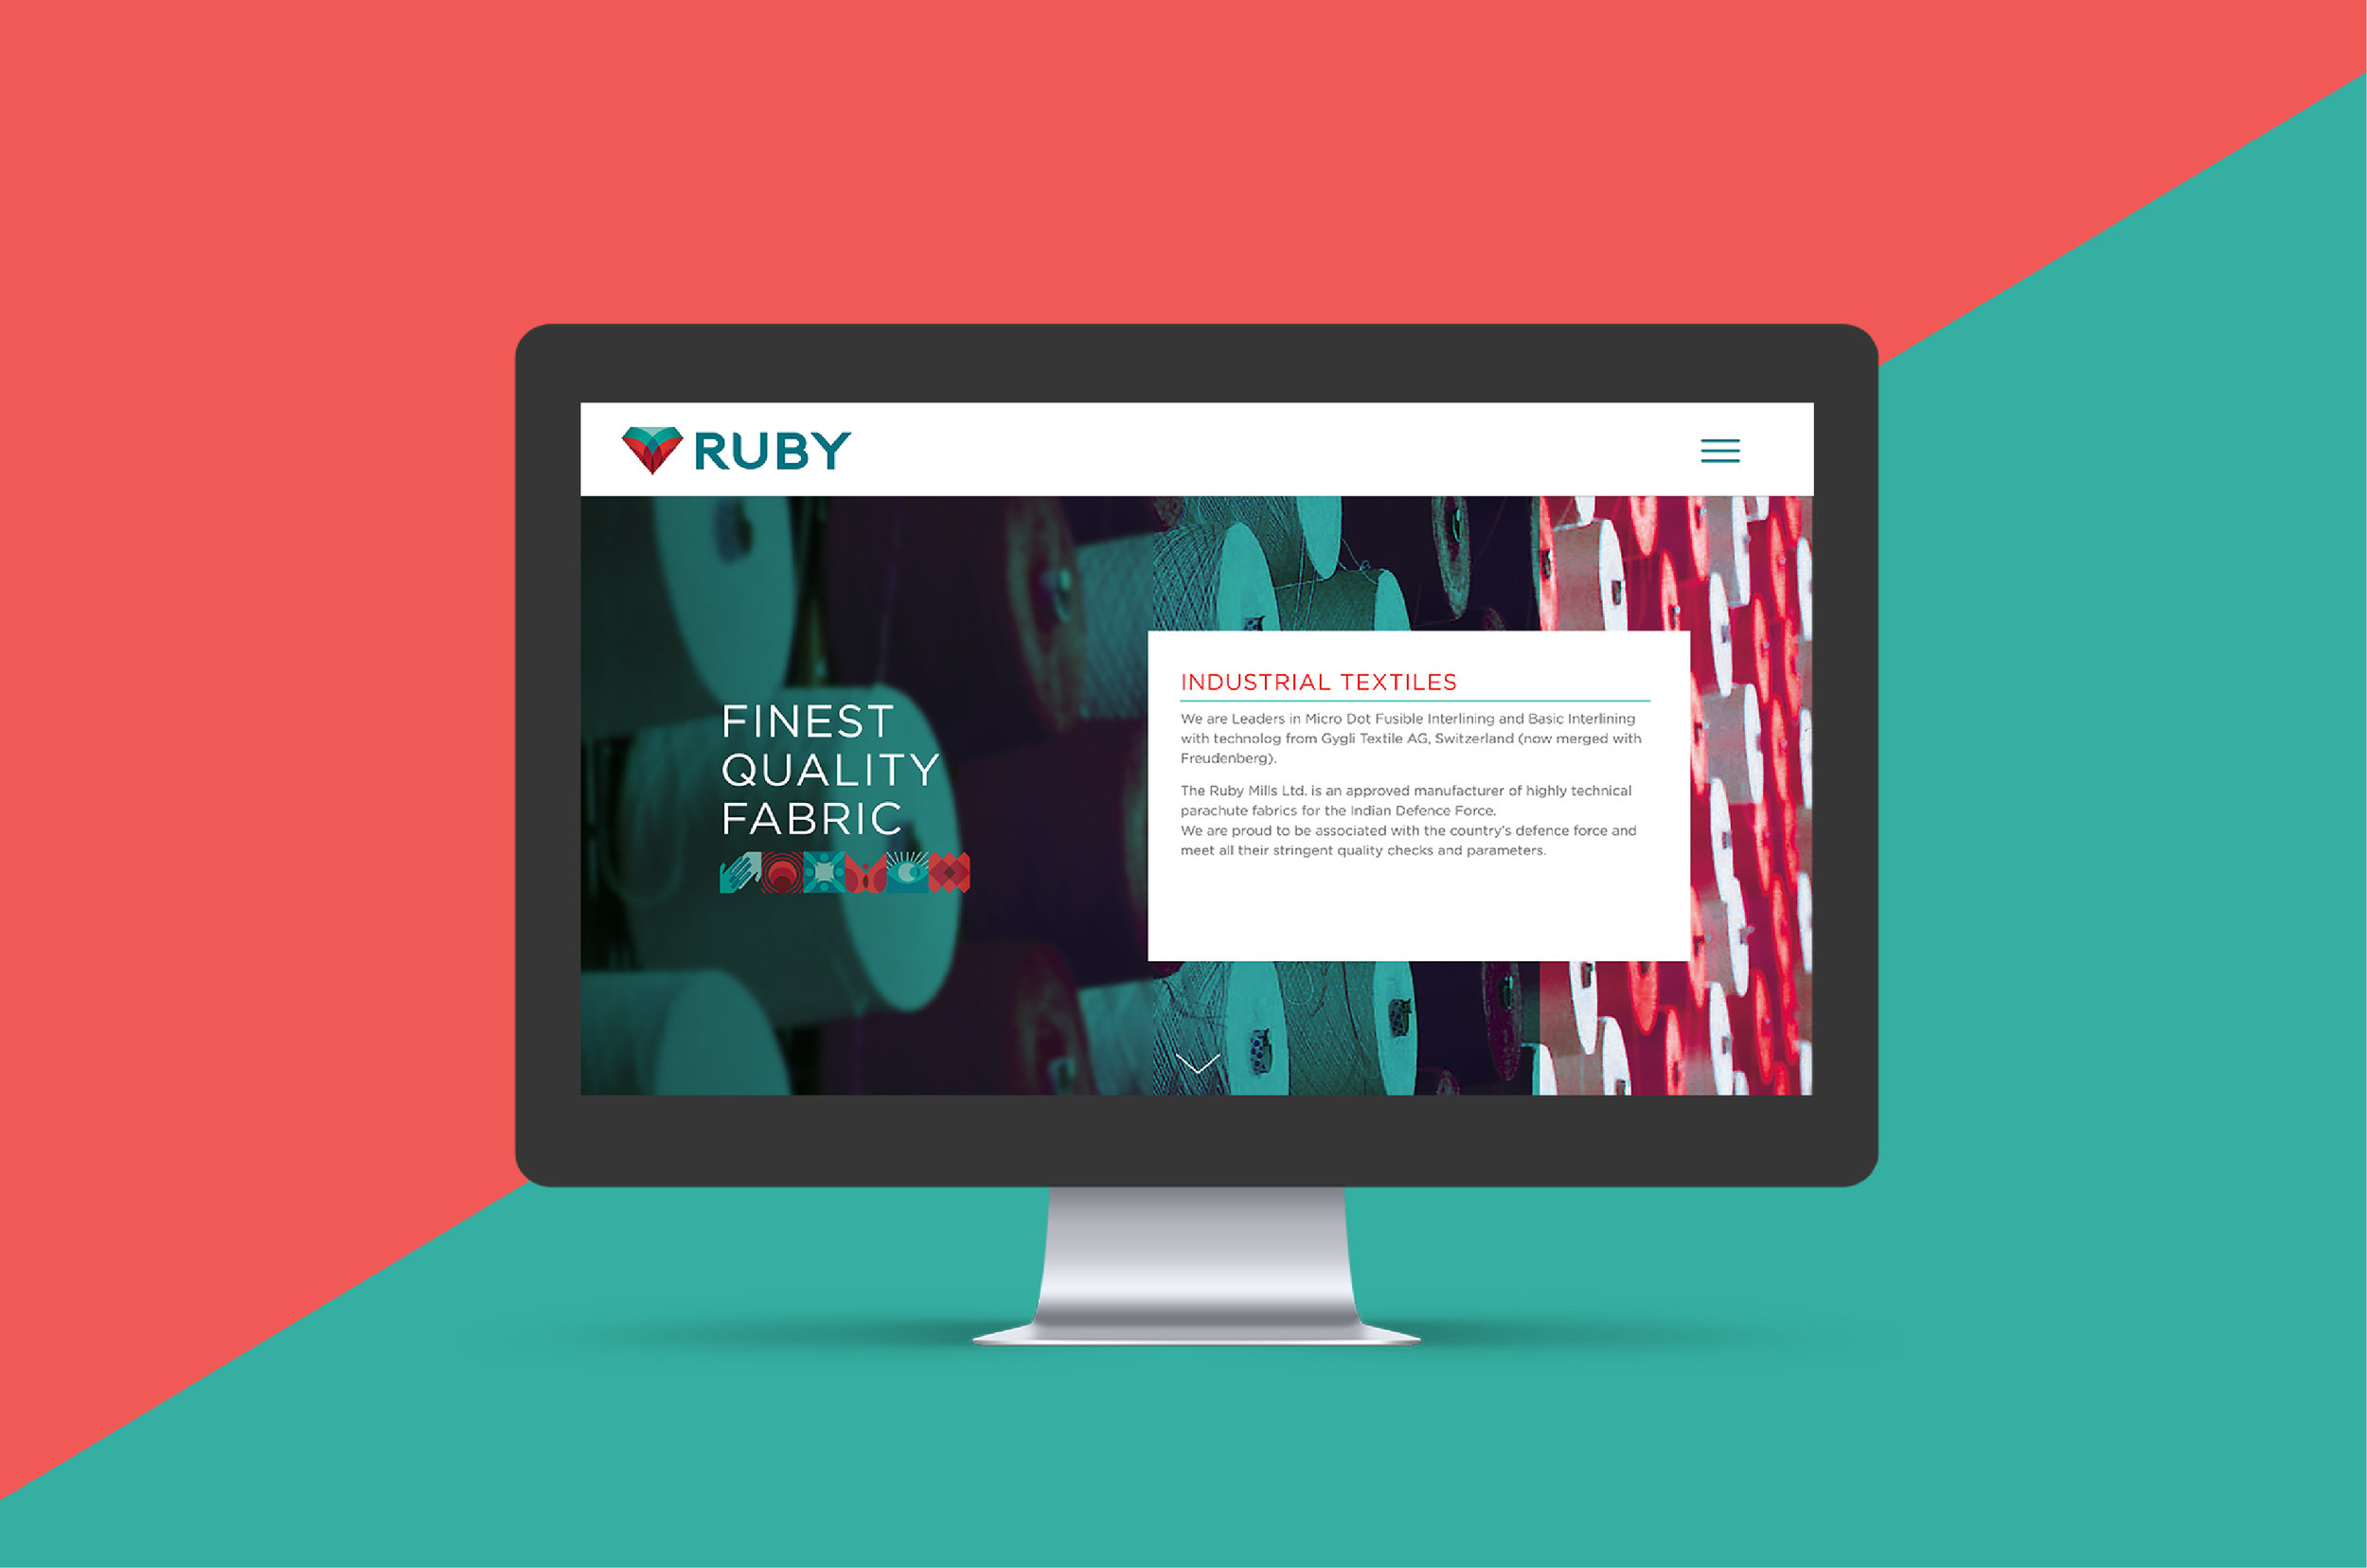 Ruby Mills_Branding Strategy, Communication Design_Elephant Design, Pune, Singapore_7.jpg